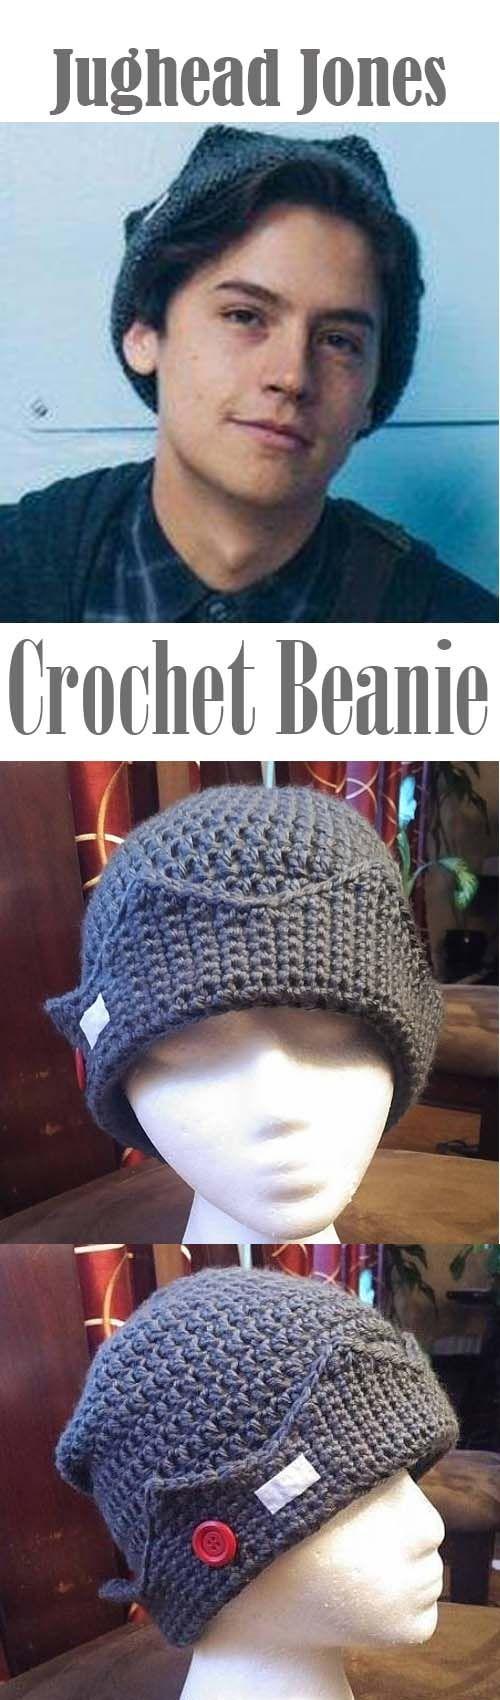 Jughead inspired beanie/Riverdale hat/Jughead Jones cap/unisex hat/teen hat/crown hat/grey cap/winter toque/crochet cap/tvshow inspire #affiliate